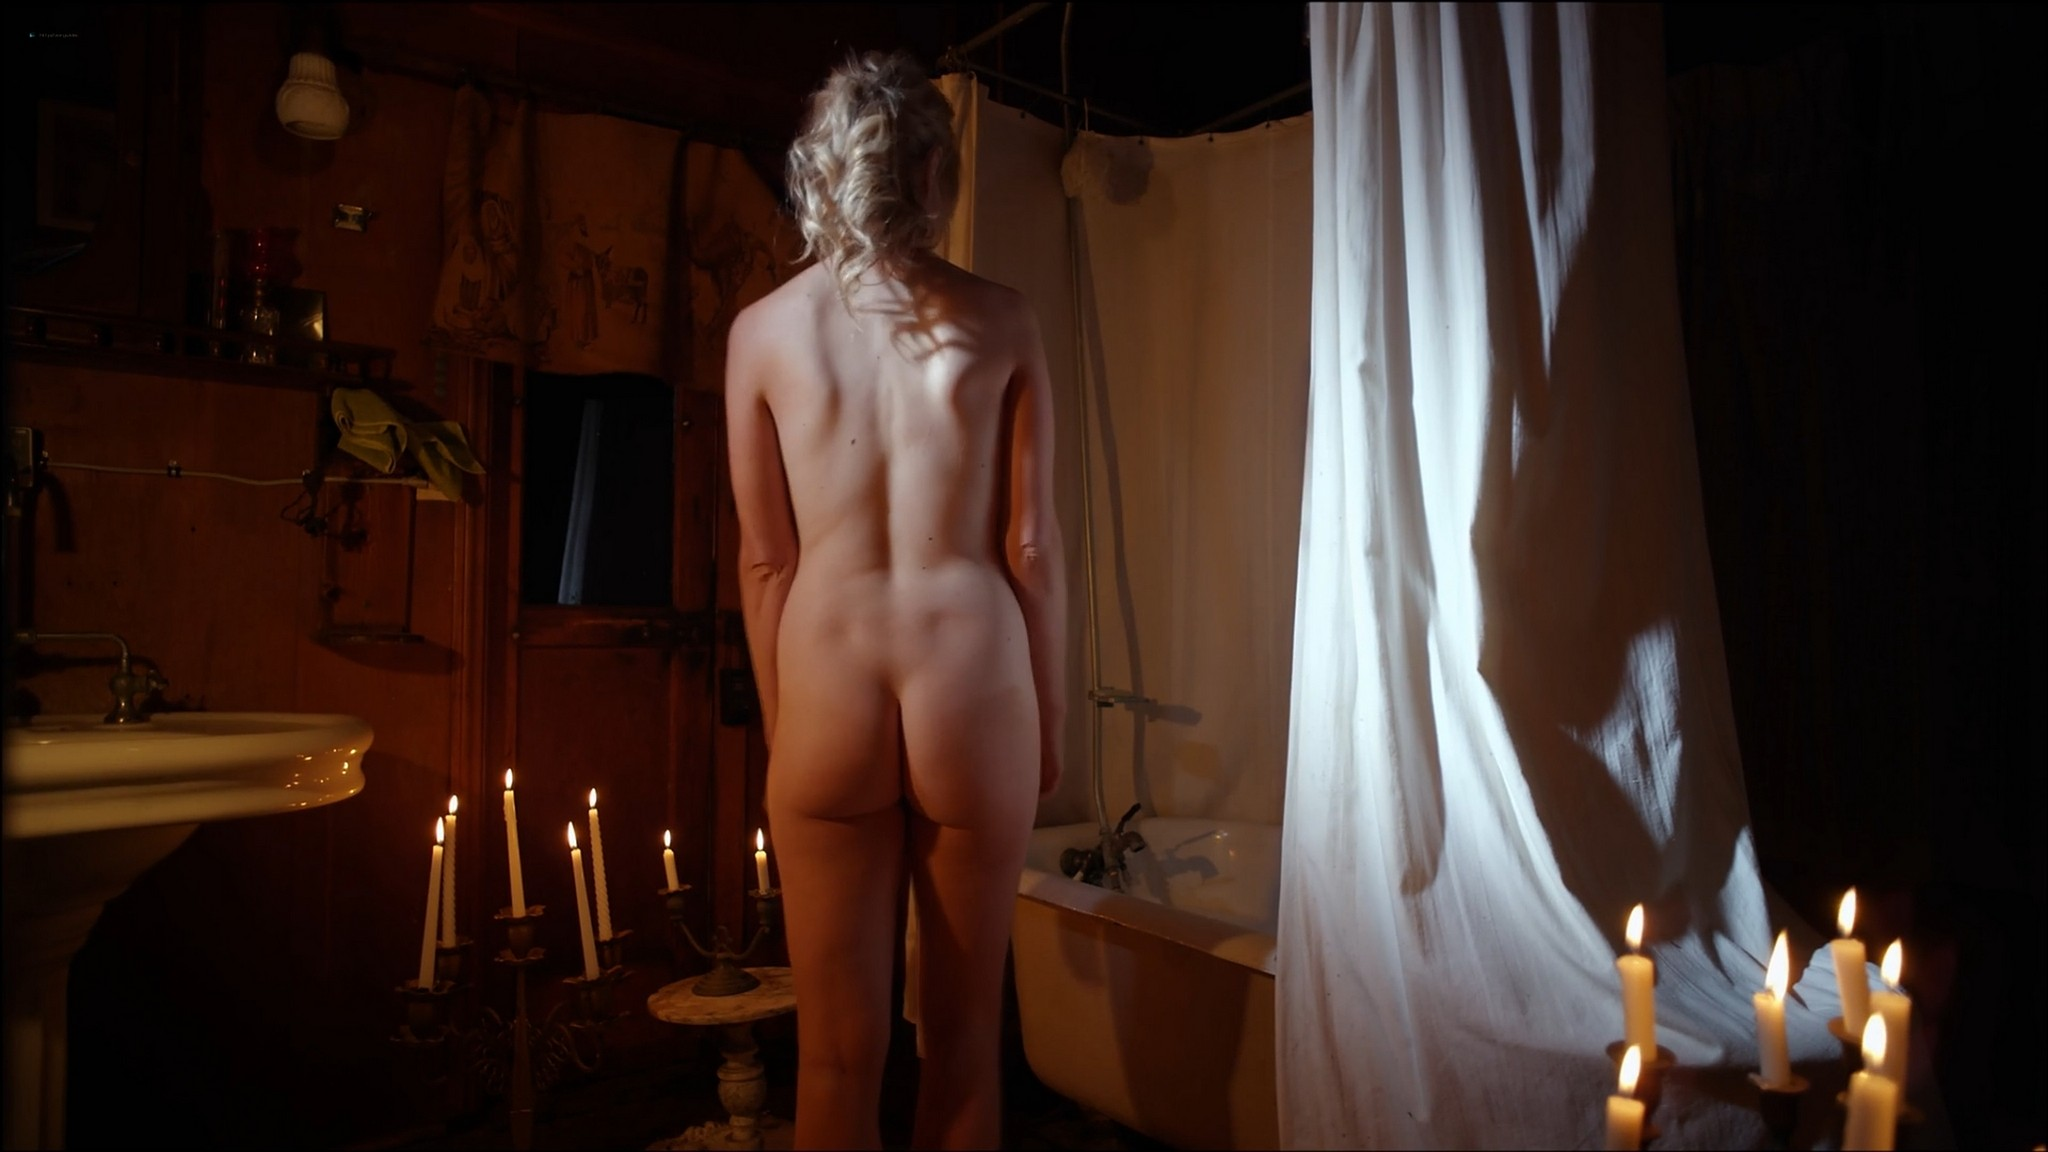 Mindy Robinson see through Christina Collard nude Dracula The Impaler 2013 1080p BluRay 4